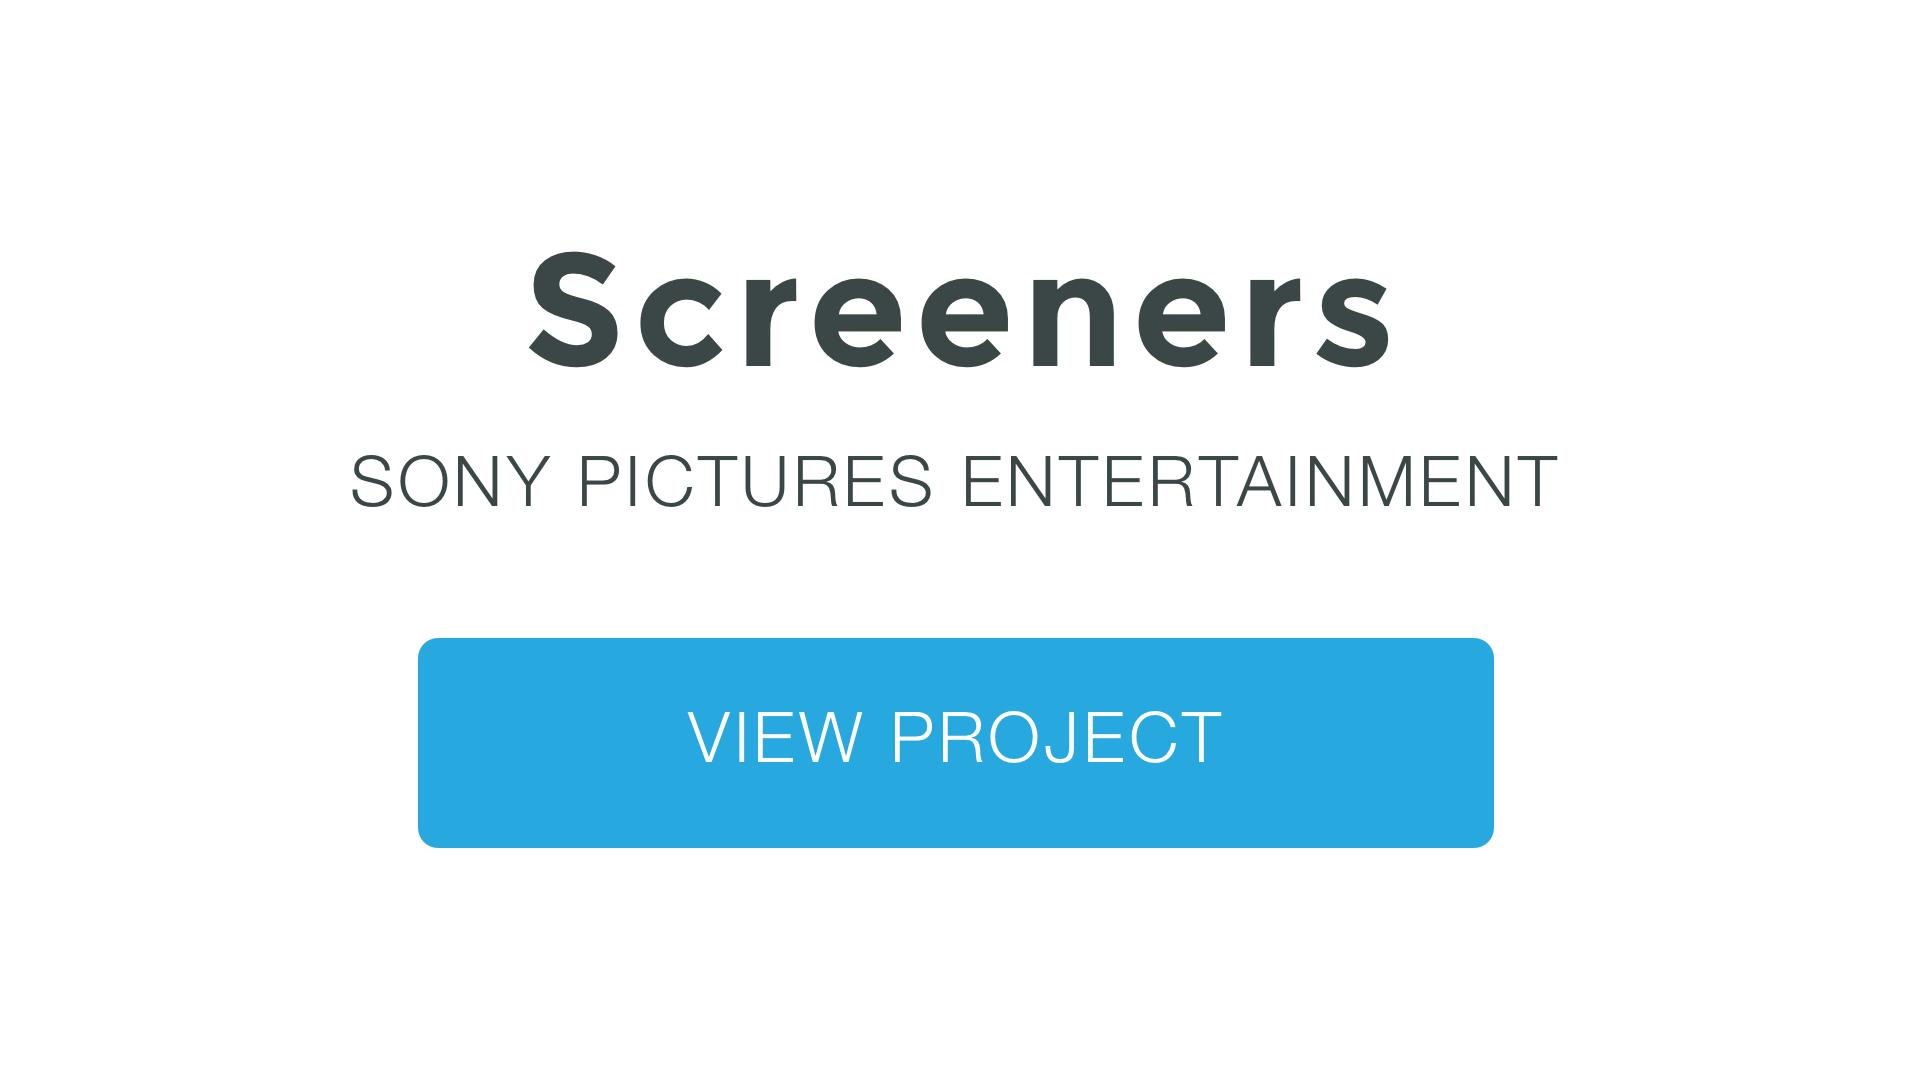 Screeners_View2@2x.png